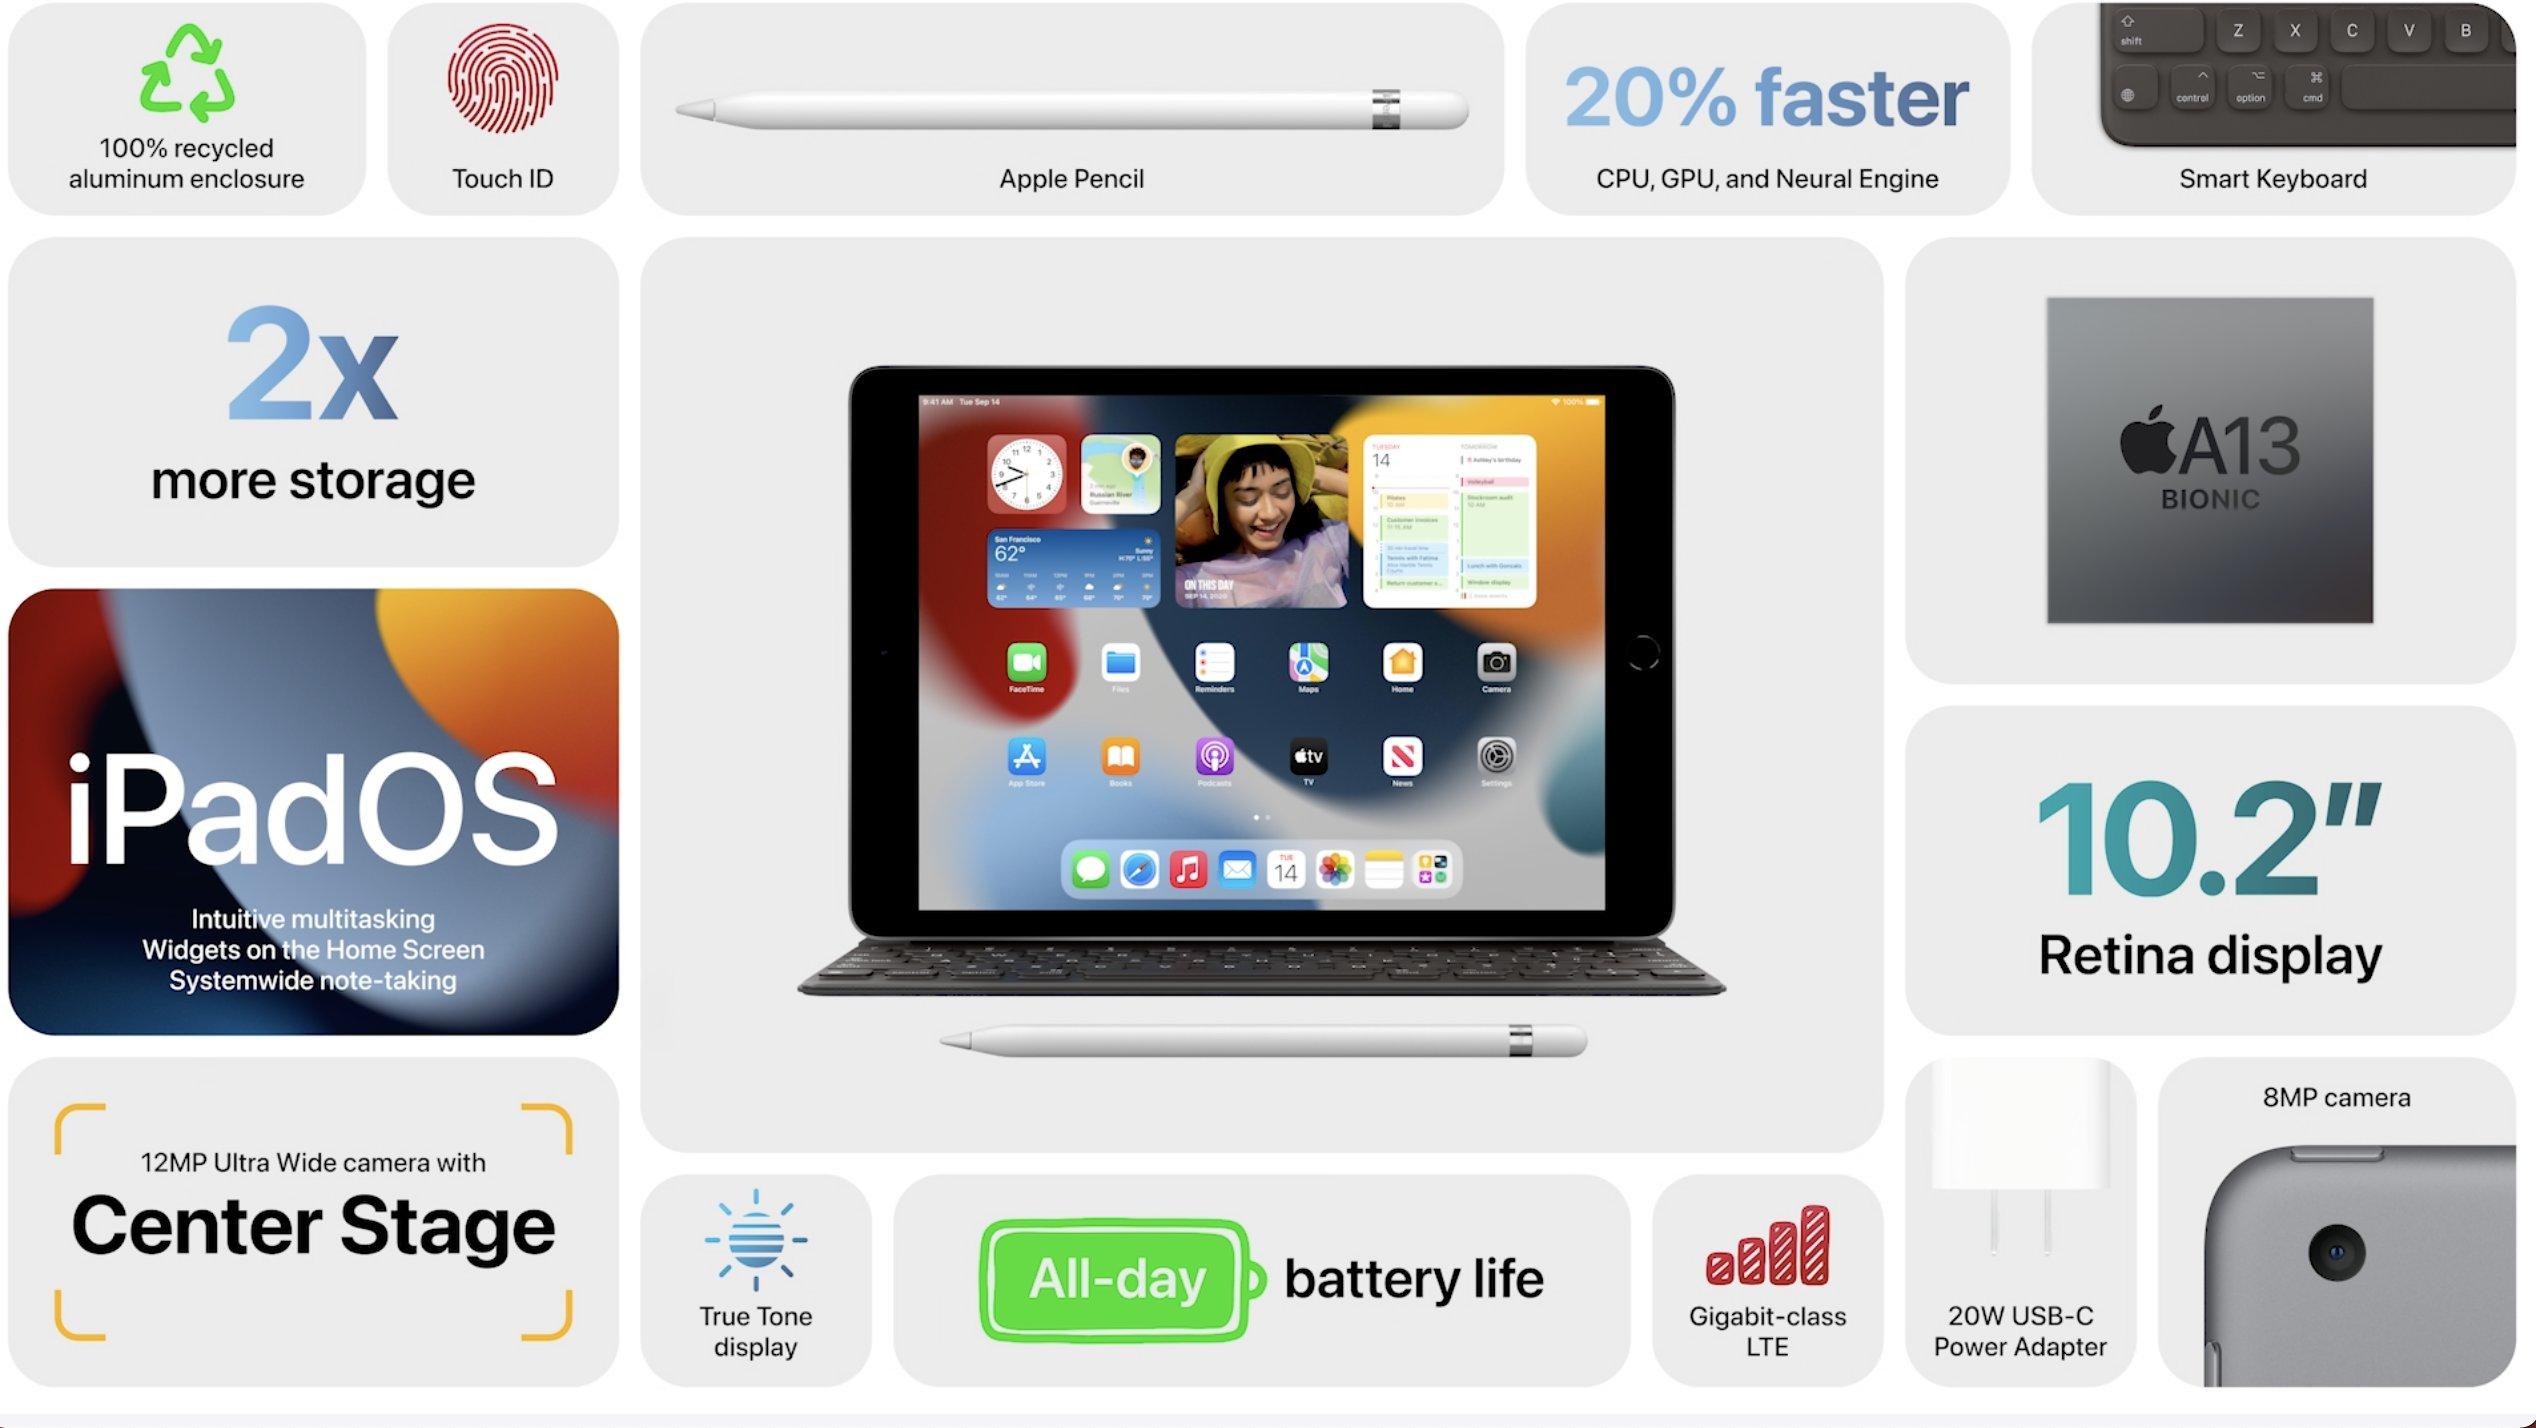 E QvnDuX0AQfmkN?format=jpg&name=4096x4096 - Apple announces new entry-level iPad for 2021